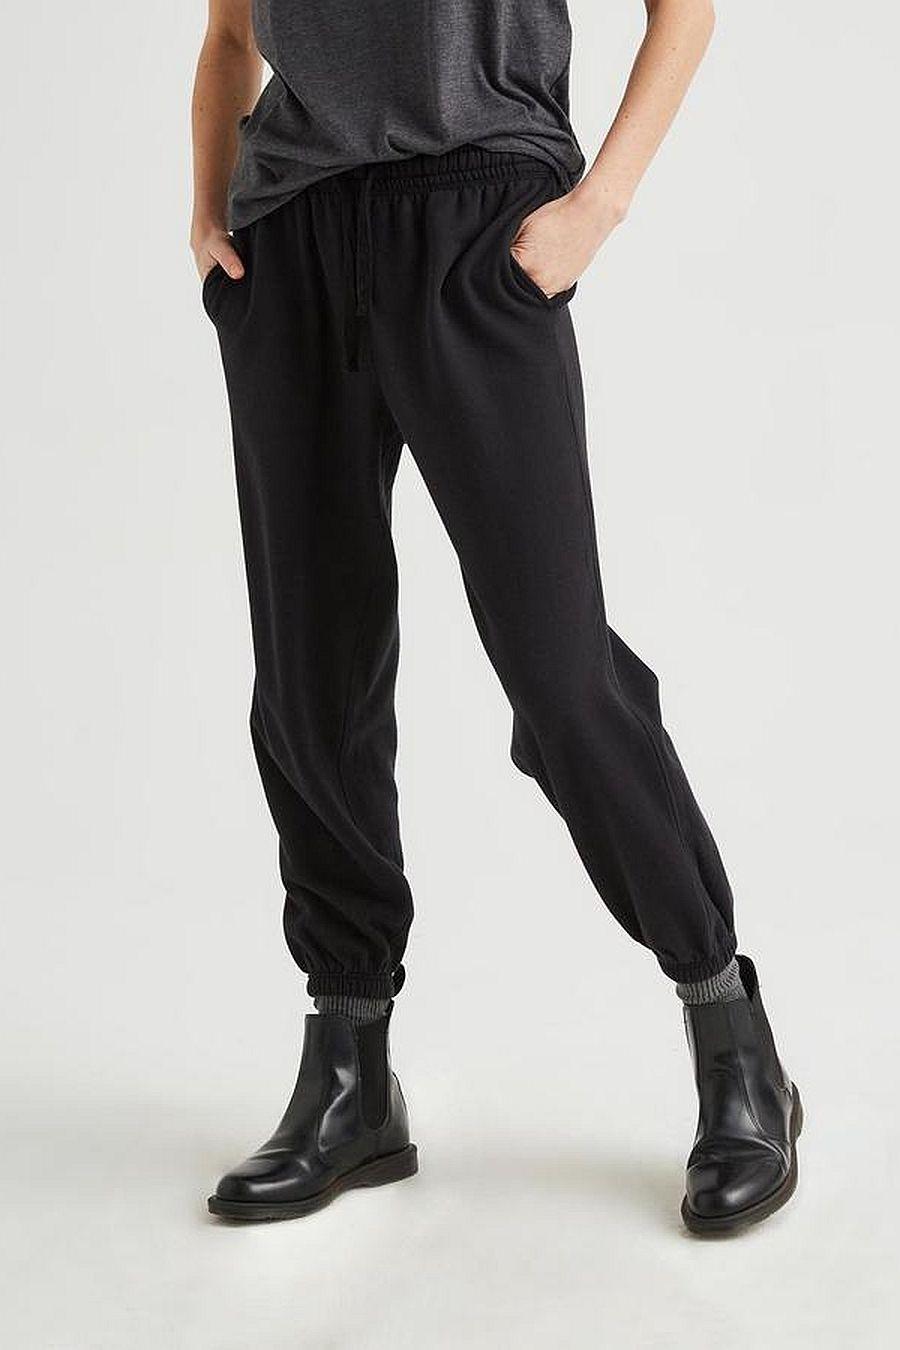 Richer Poorer Fleece Sweatpant - Black